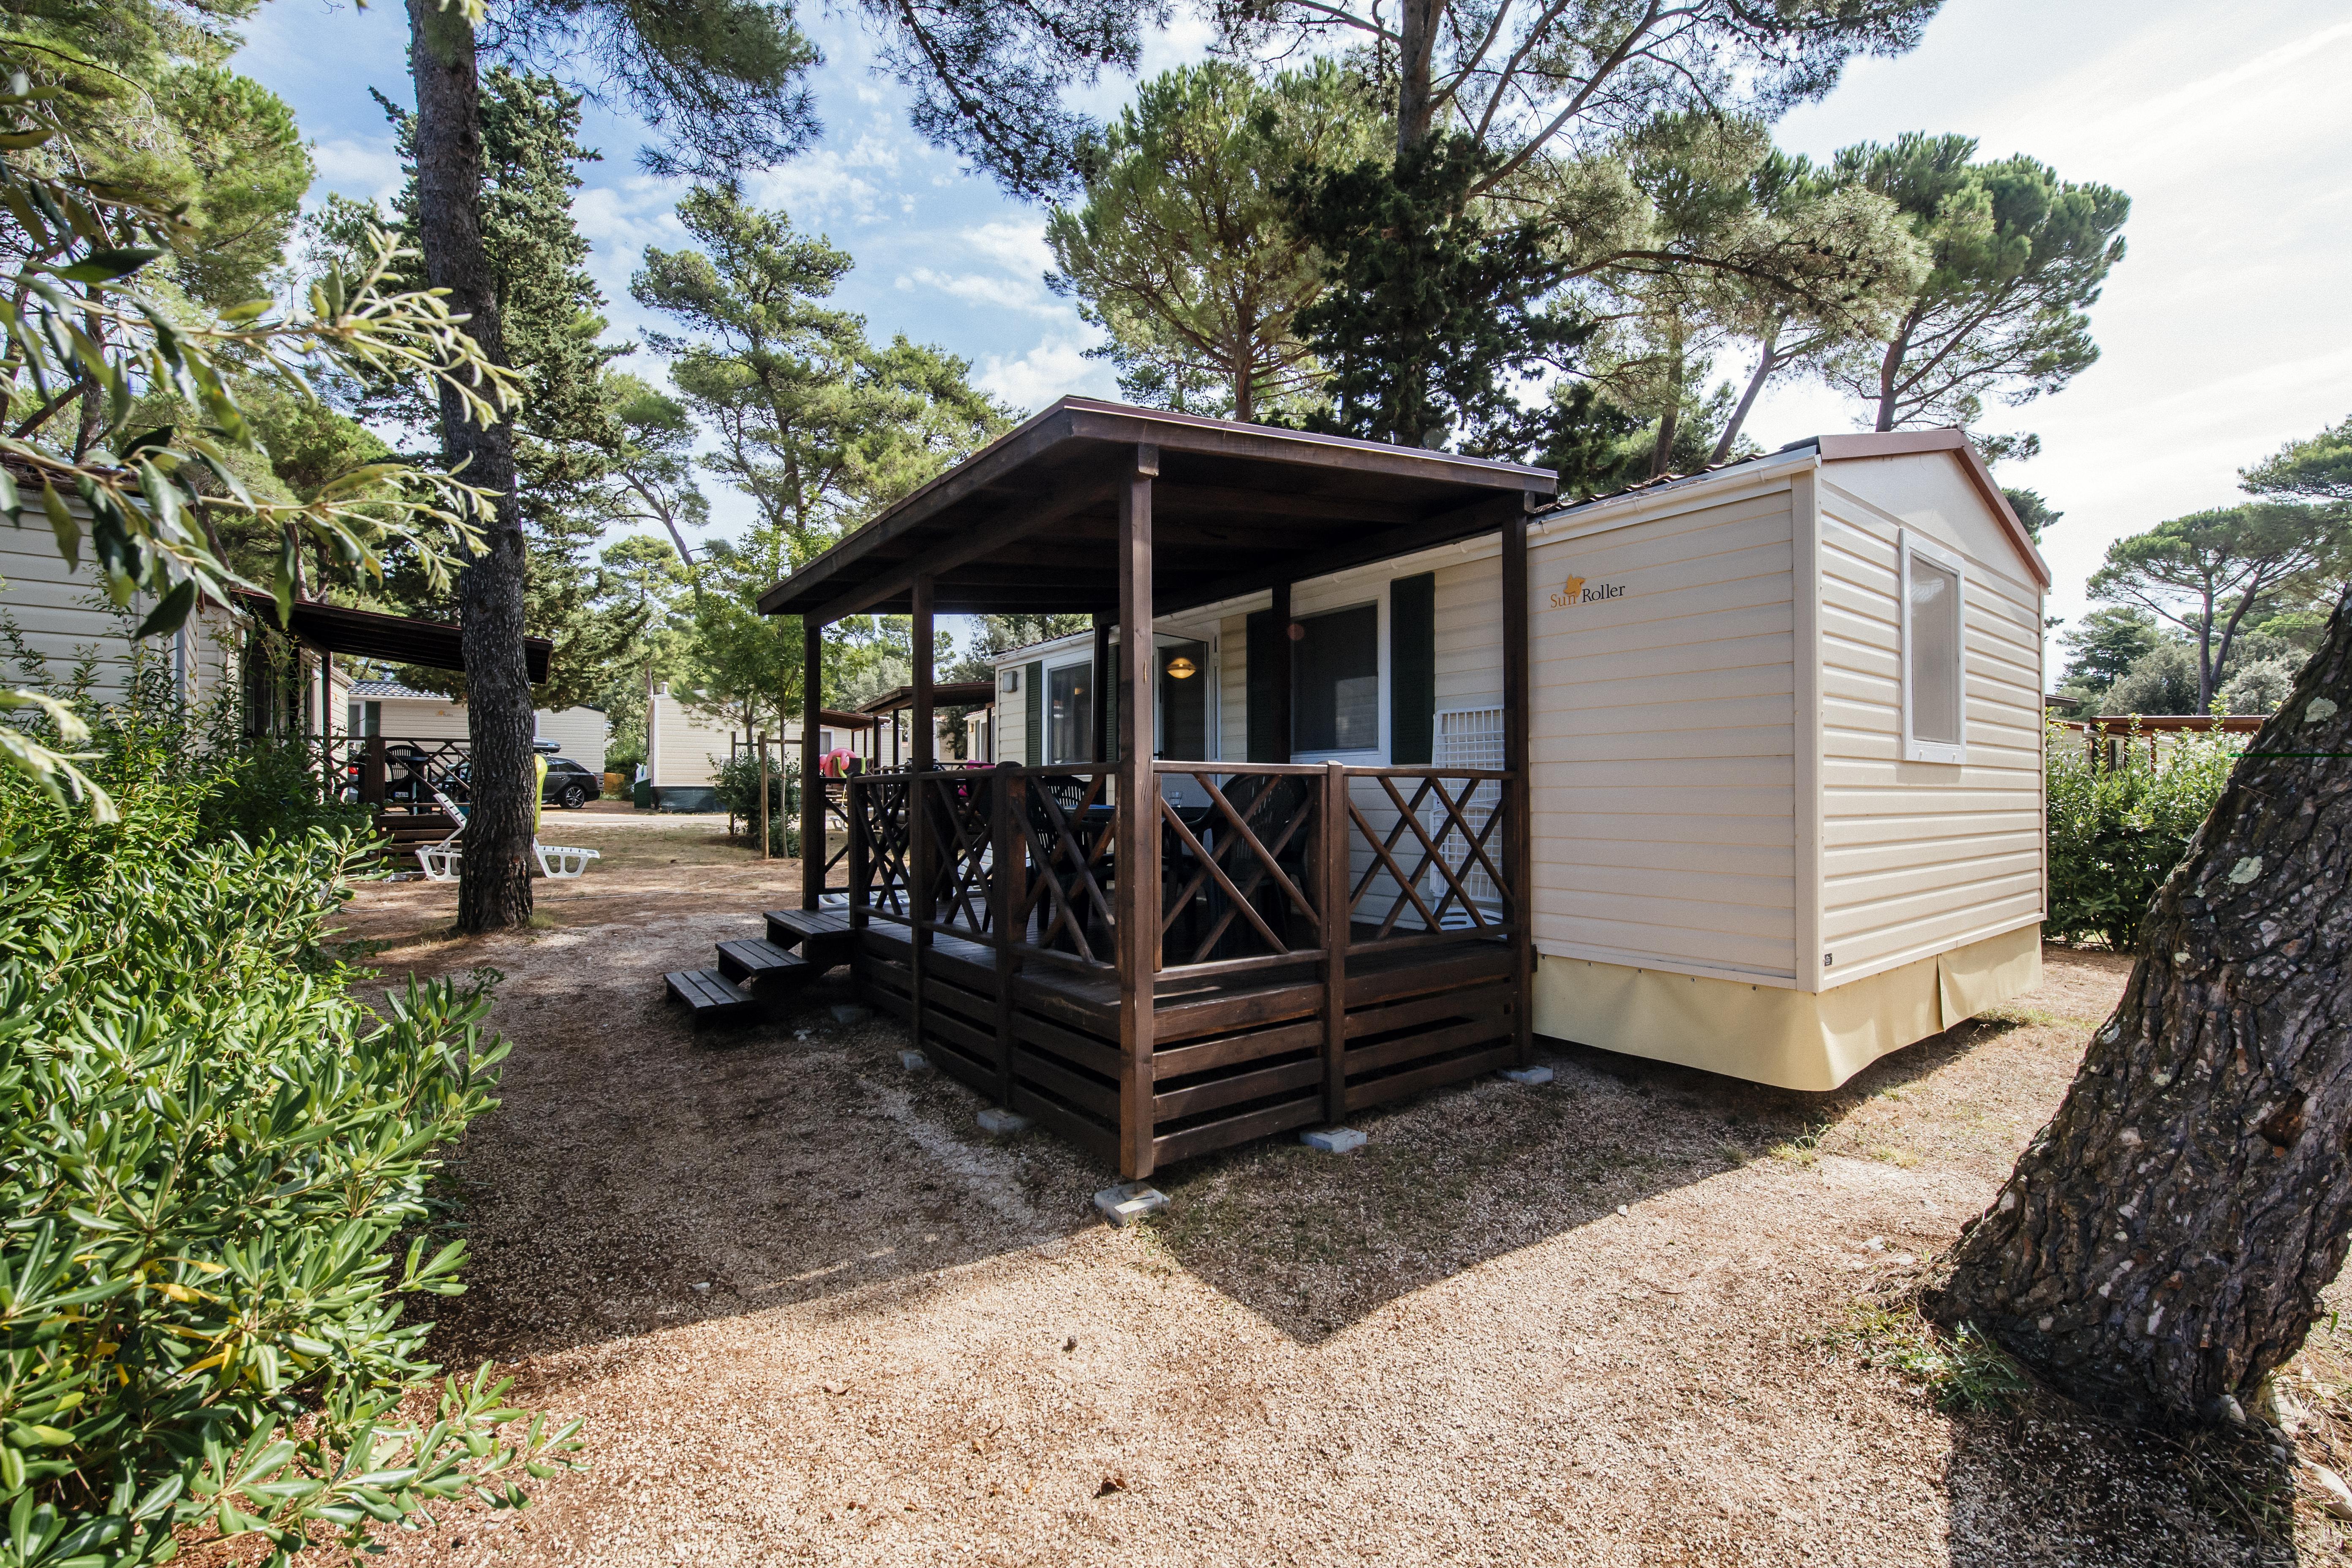 https://cms.satur.sk/data/imgs/tour_image/orig/mobile-homes-comfort-09-1870160.jpg